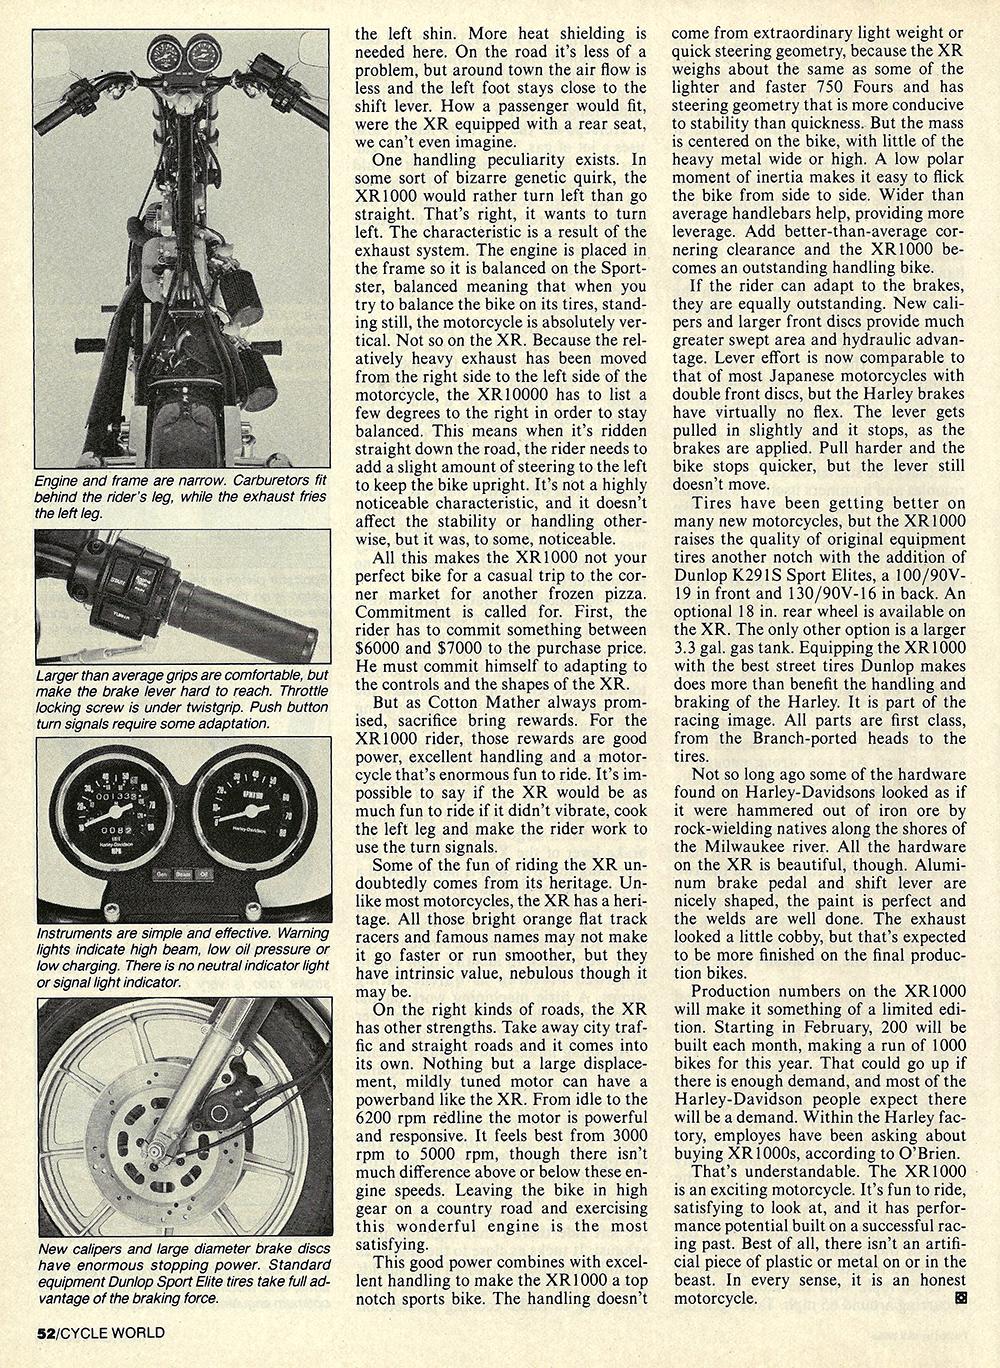 1983 Harley-Davidson XR1000 road test 07.jpg